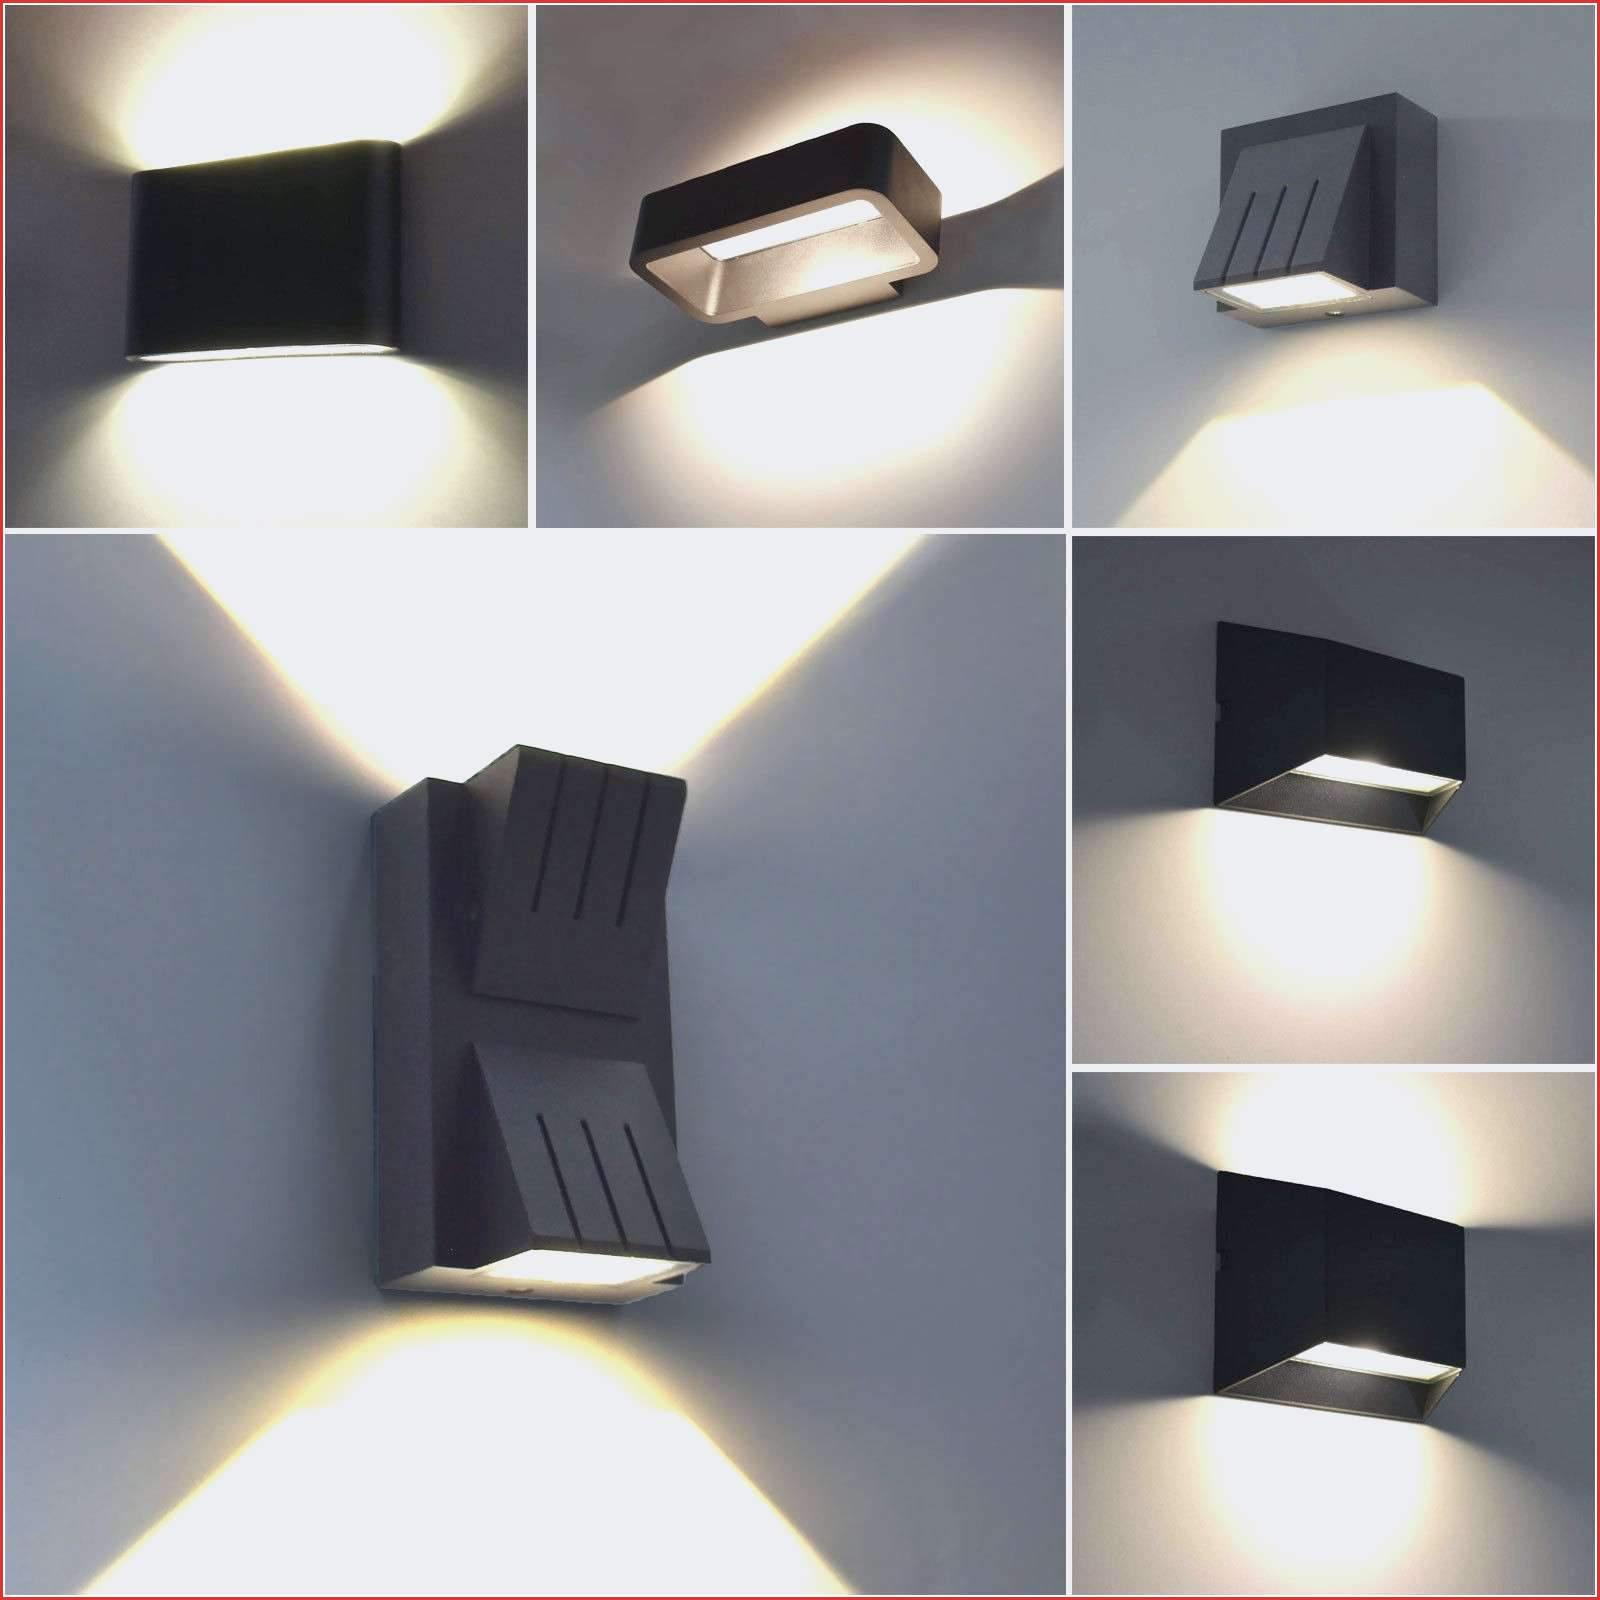 Full Size of Schlafzimmer Wandlampe Wandlampen Led Dimmbar Modern Mit Schalter Wandleuchte Schwenkbar Holz Design Ikea Wohnzimmer Elegant 35 Genial Landhaus Massivholz Schlafzimmer Schlafzimmer Wandlampe